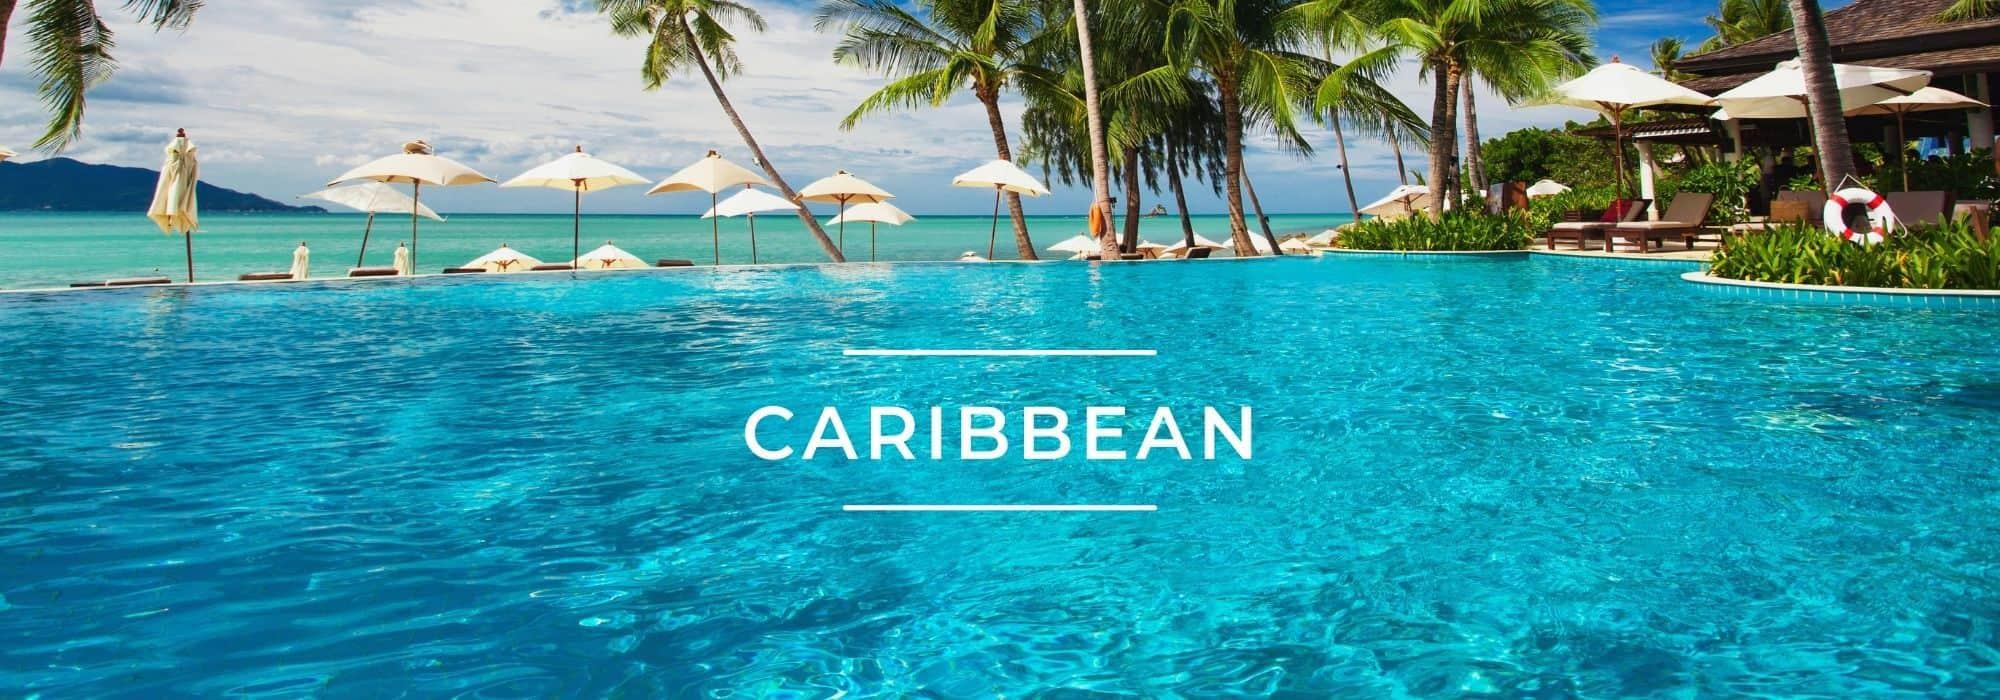 Caribbean Travel Guide